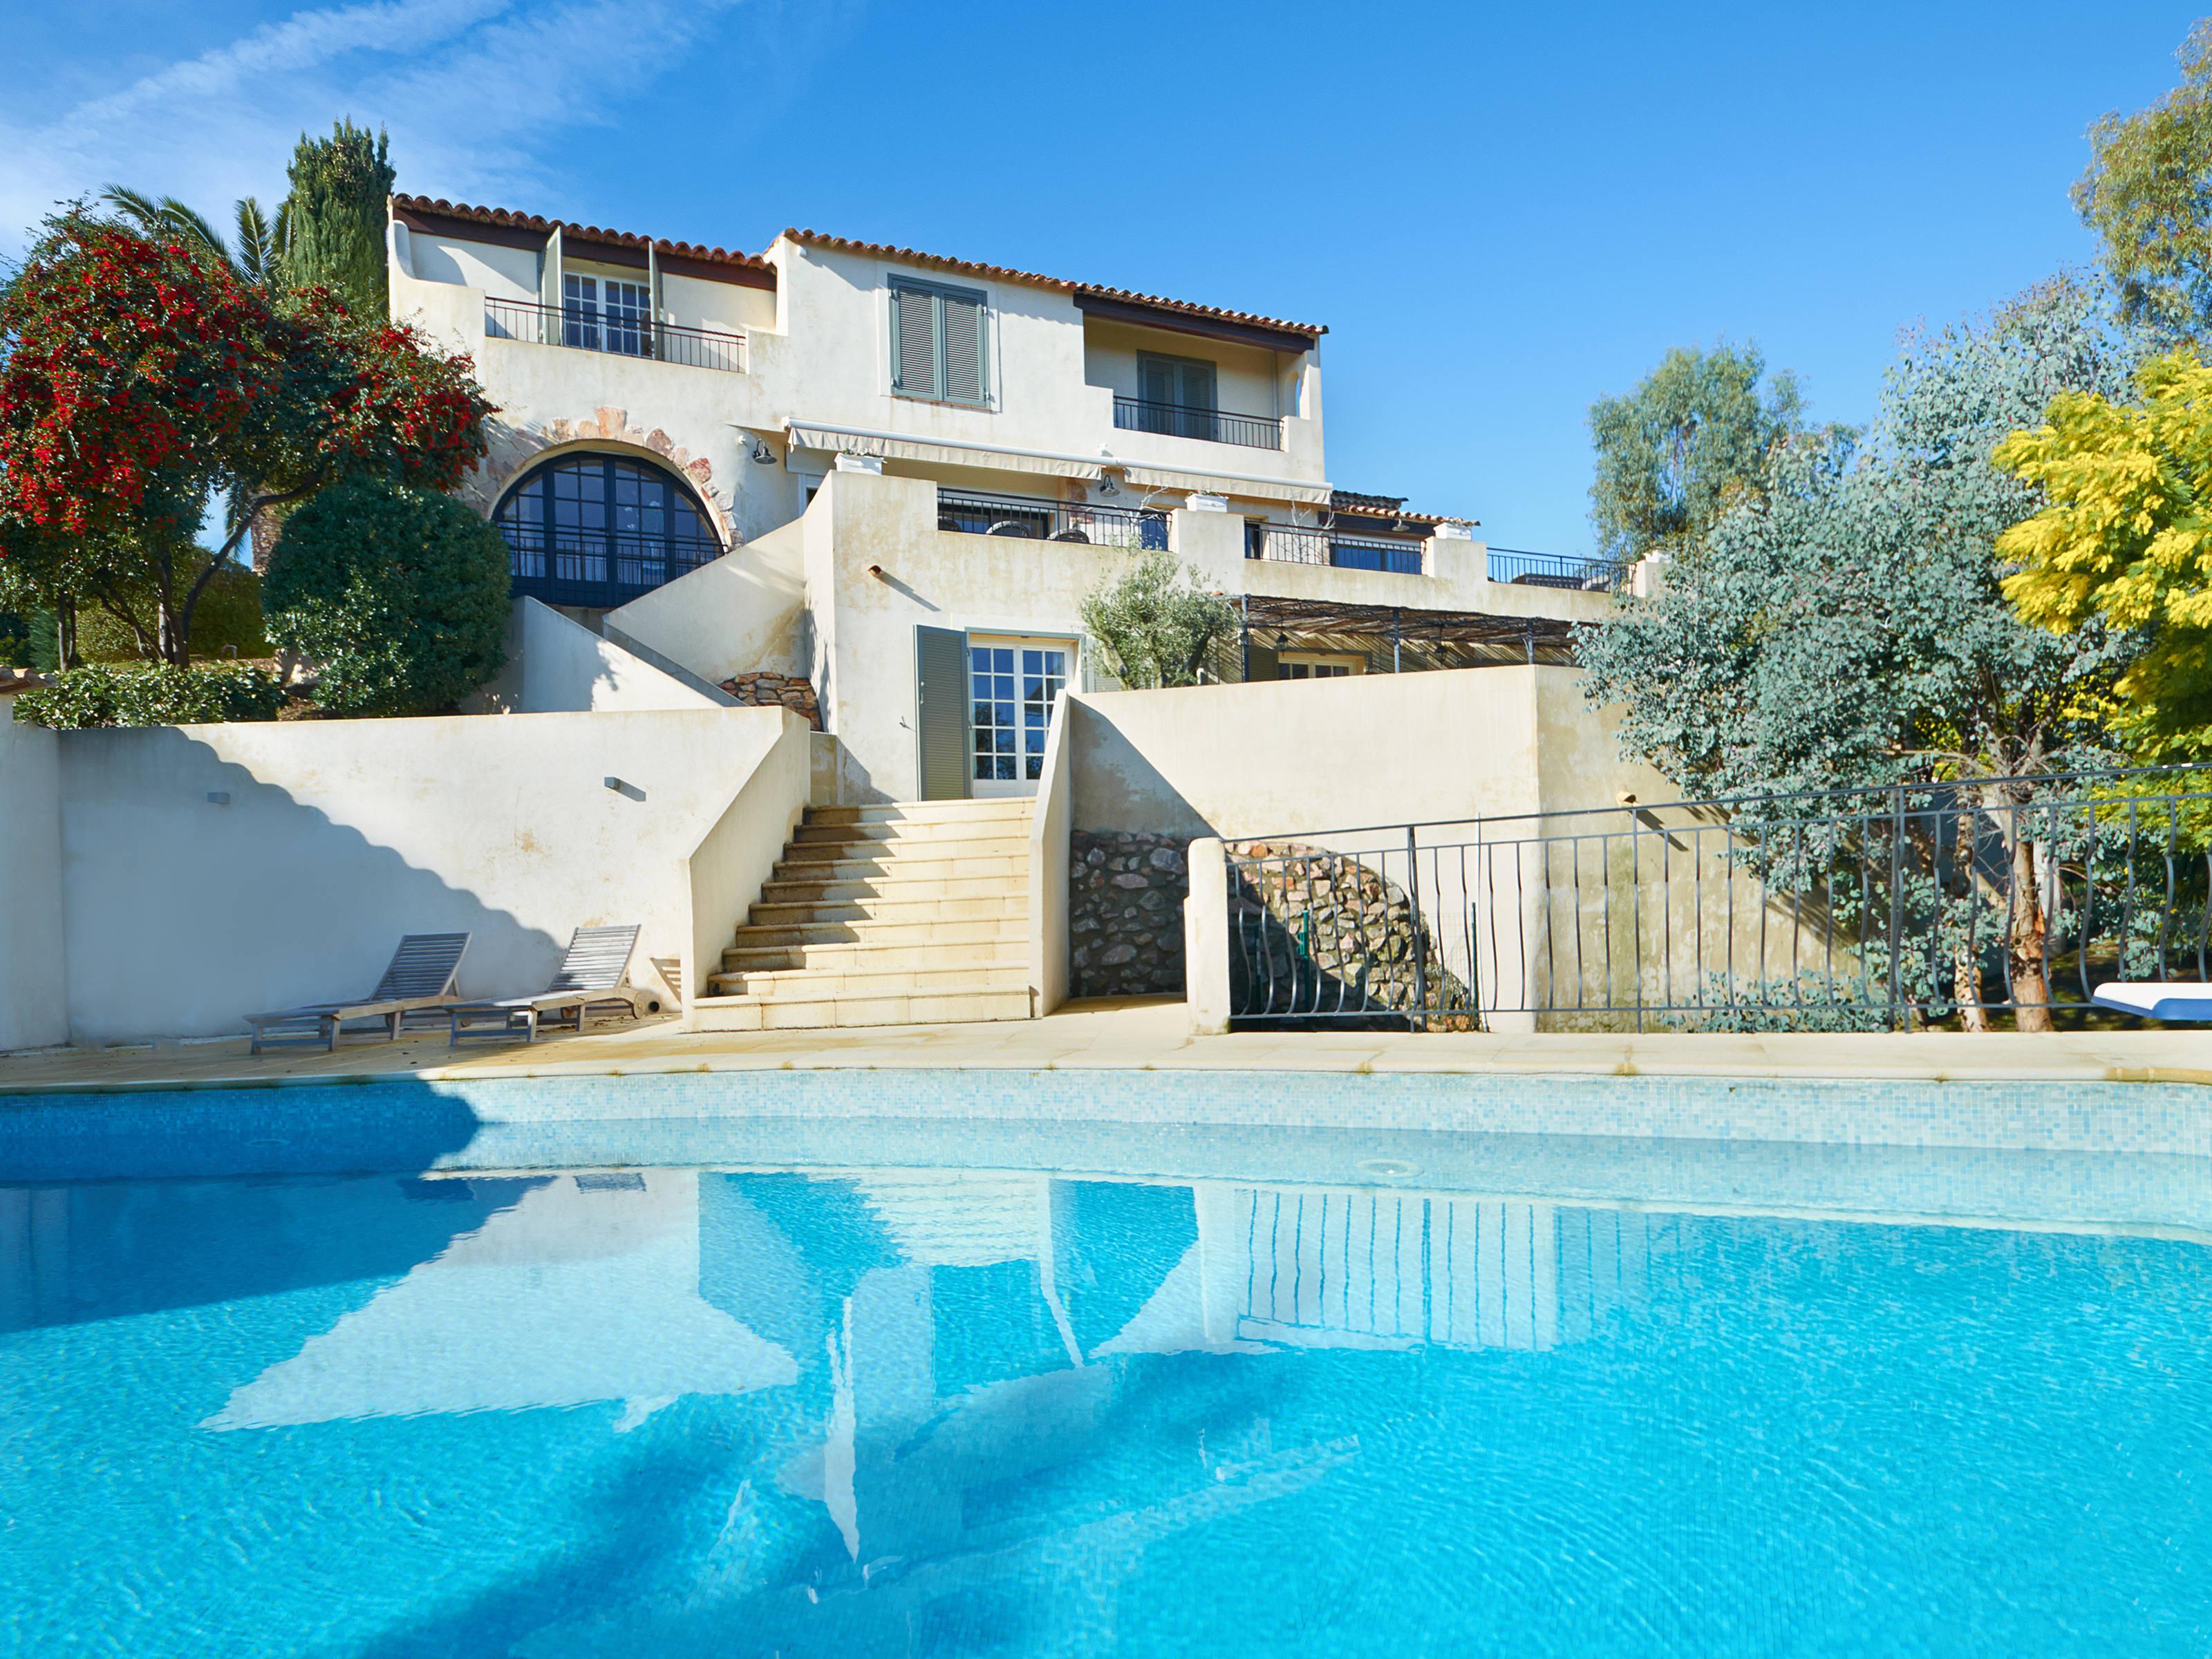 Casa Unifamiliar por un Venta en Super Cannes - Private estate - luxury renovated villa with sea view Cannes, Provincia - Alpes - Costa Azul 06400 Francia